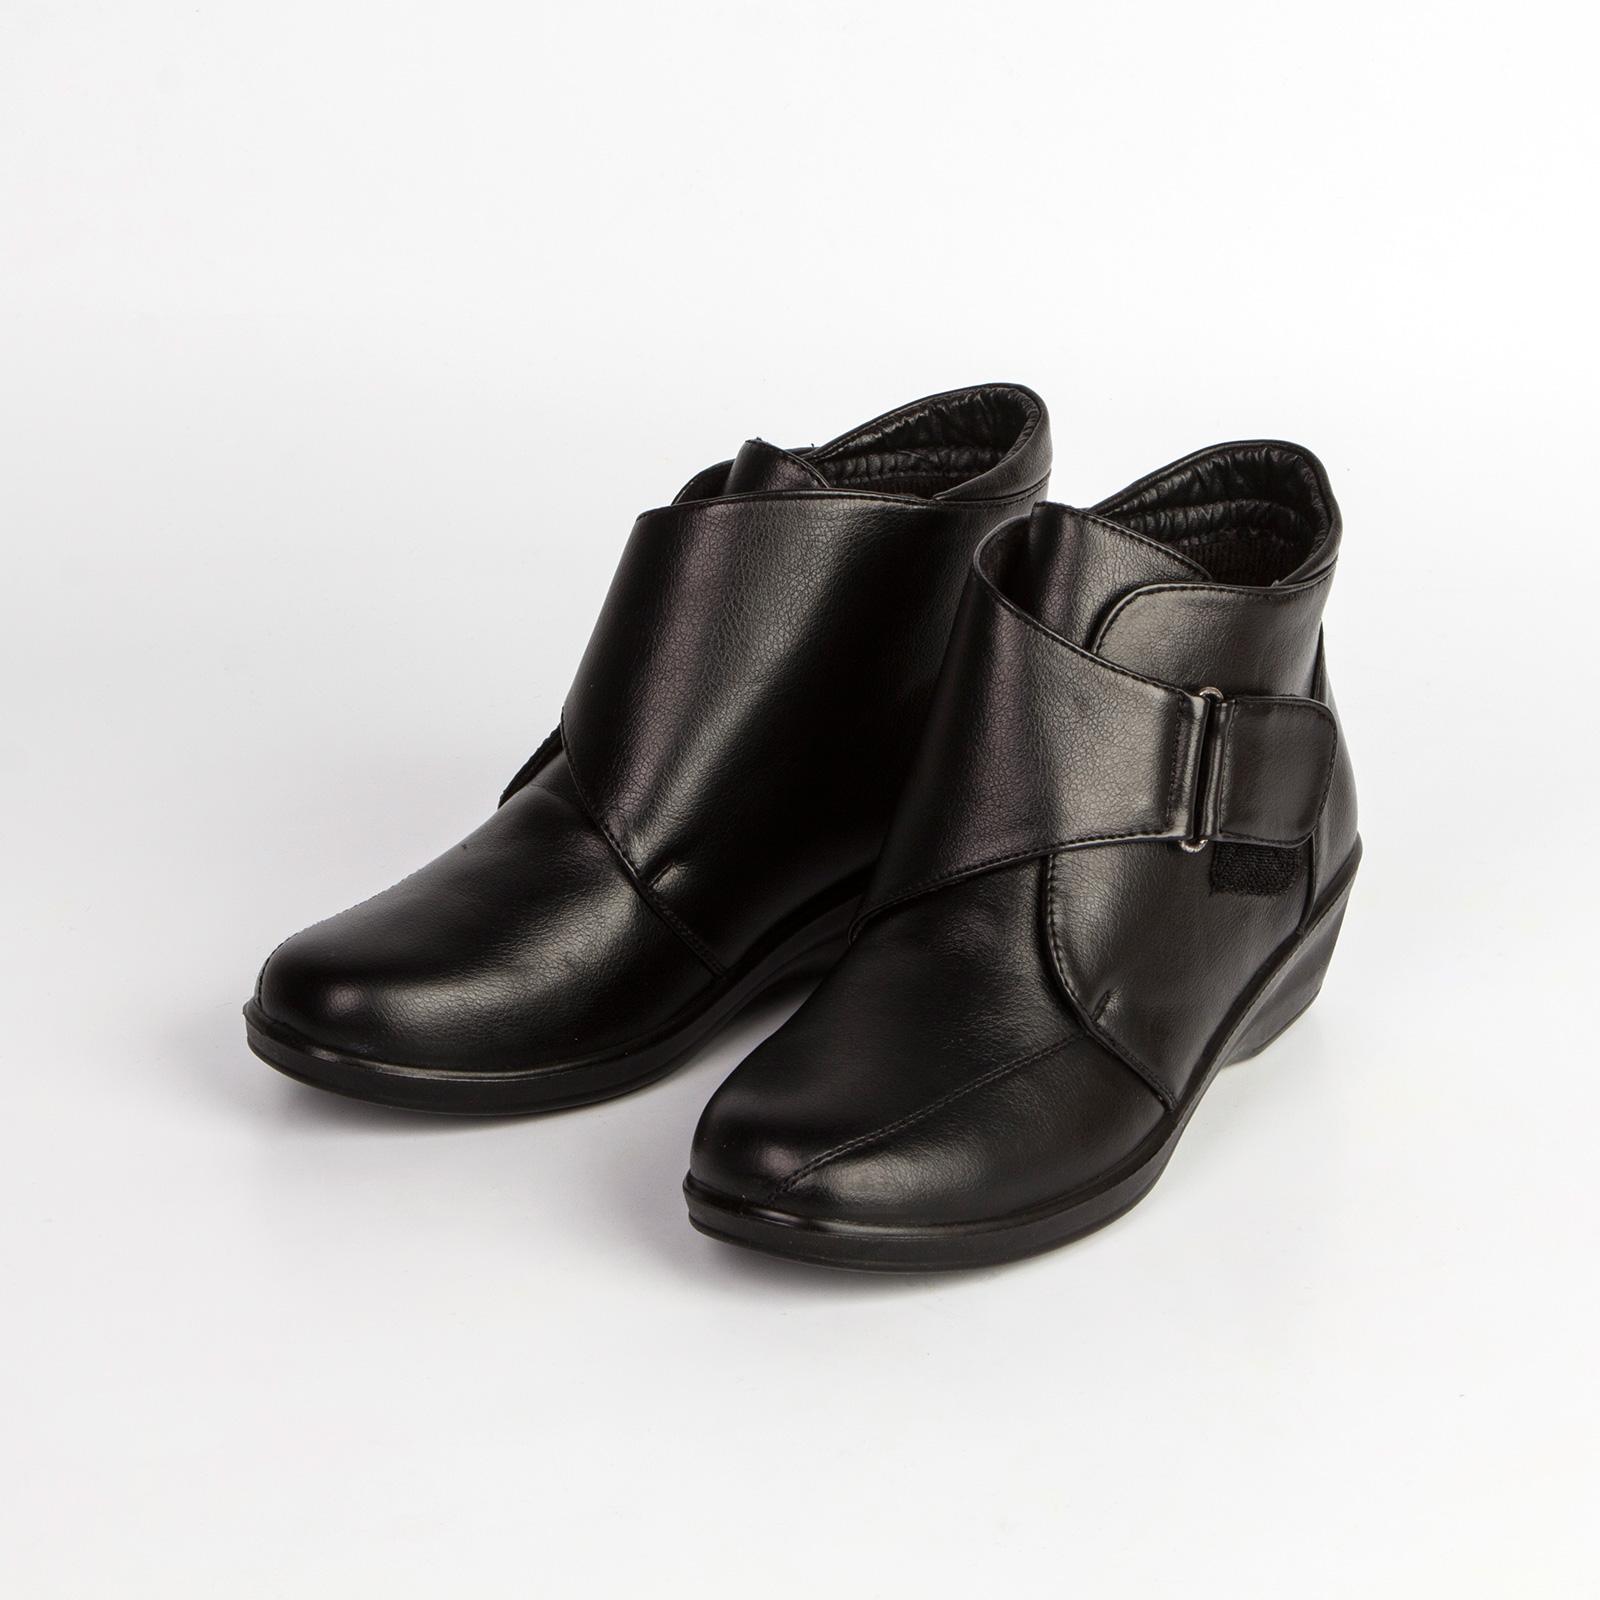 Ботинки женские с ремешком на липучке